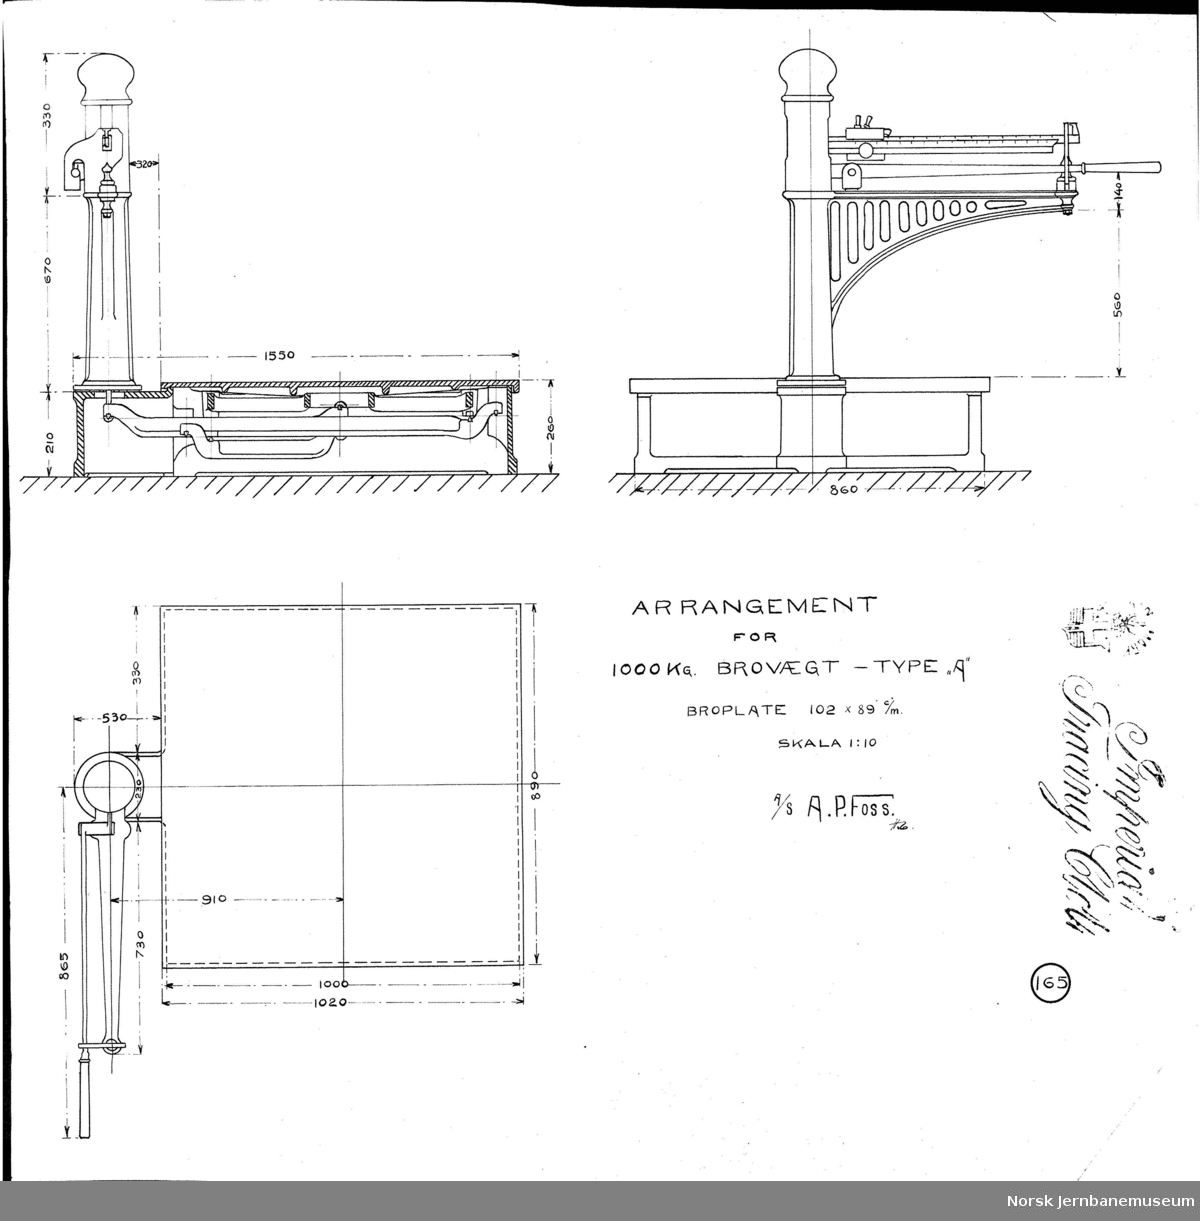 "Arrangement for 1000 kg brovægt - type ""A"" A. P. Foss tegning no. 165"